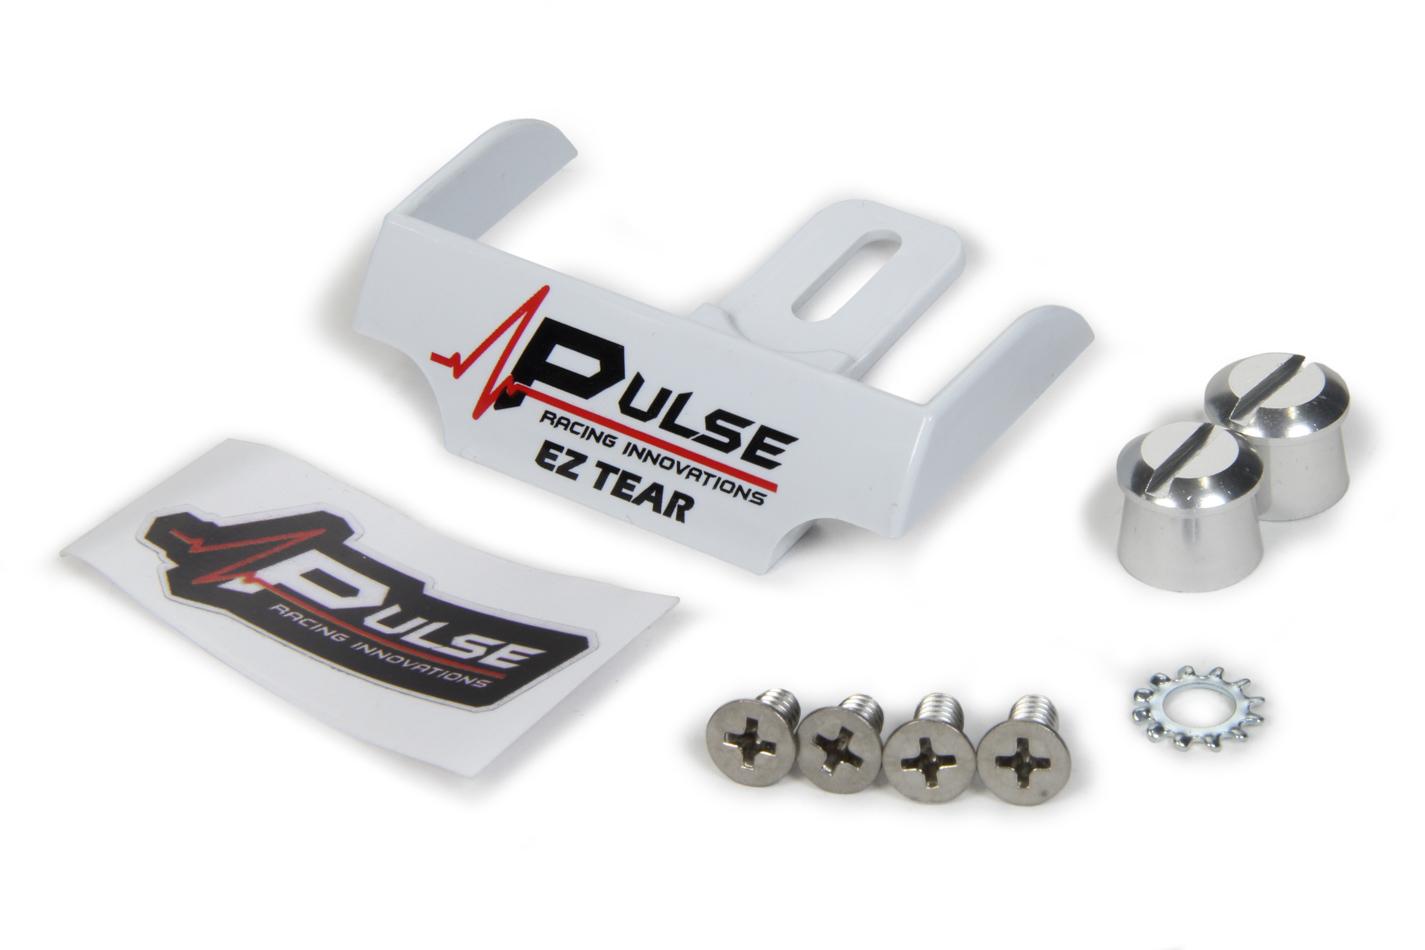 Pulse Racing Innovations EZTS102WP Helmet Tear Off Ramp, Adjustable, Aluminum Post Included, White, Kit